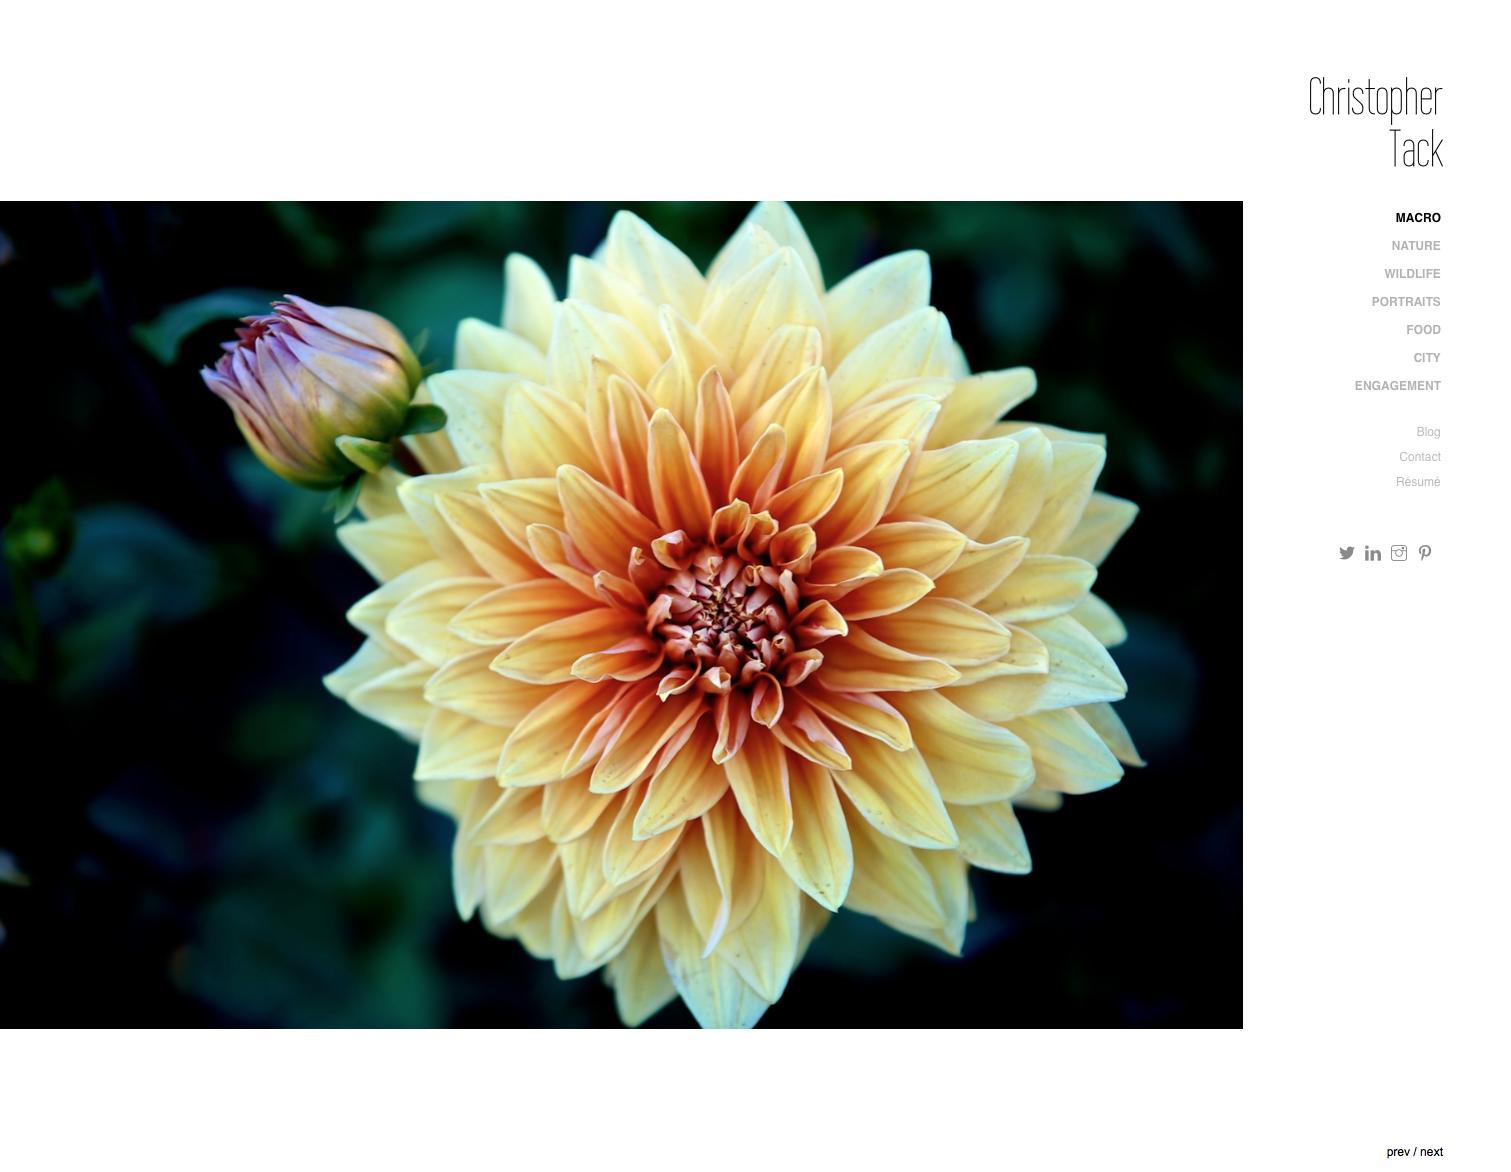 http://tackphoto.com